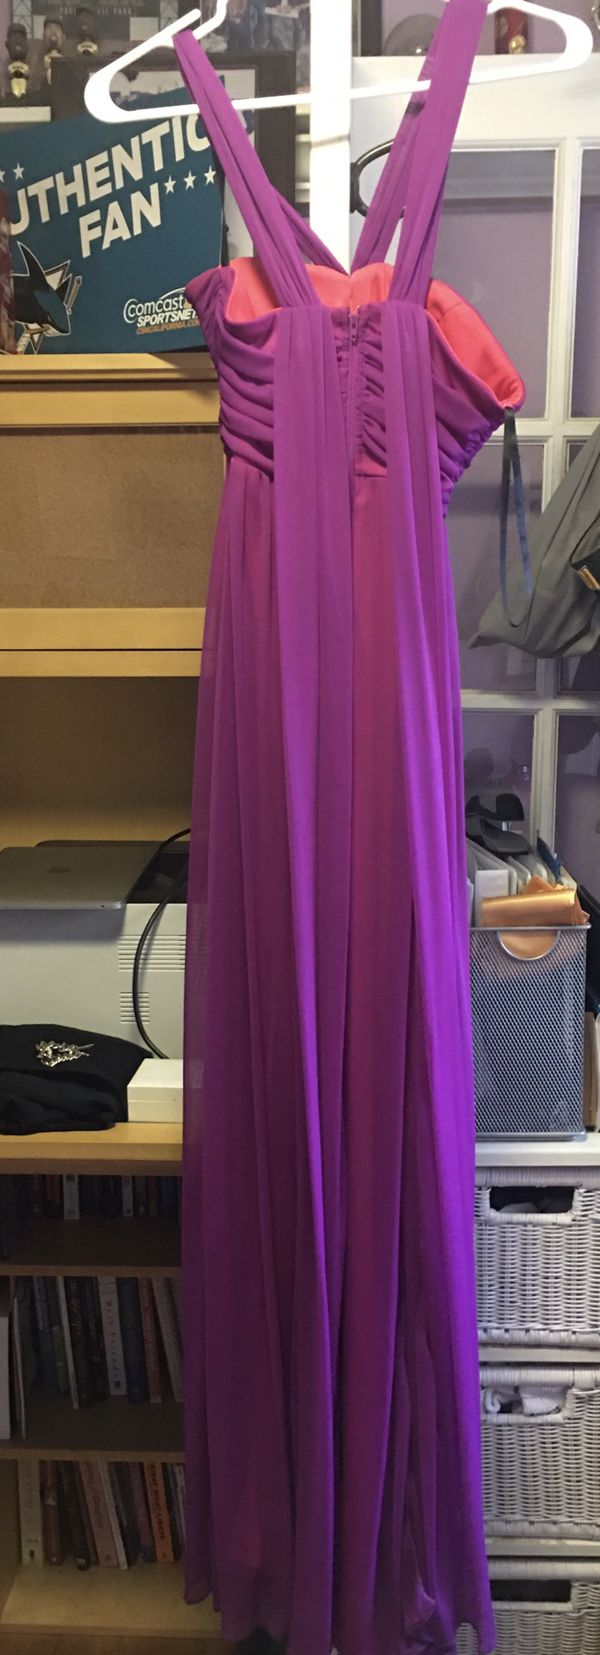 Way-In Purple and Salmon Dress